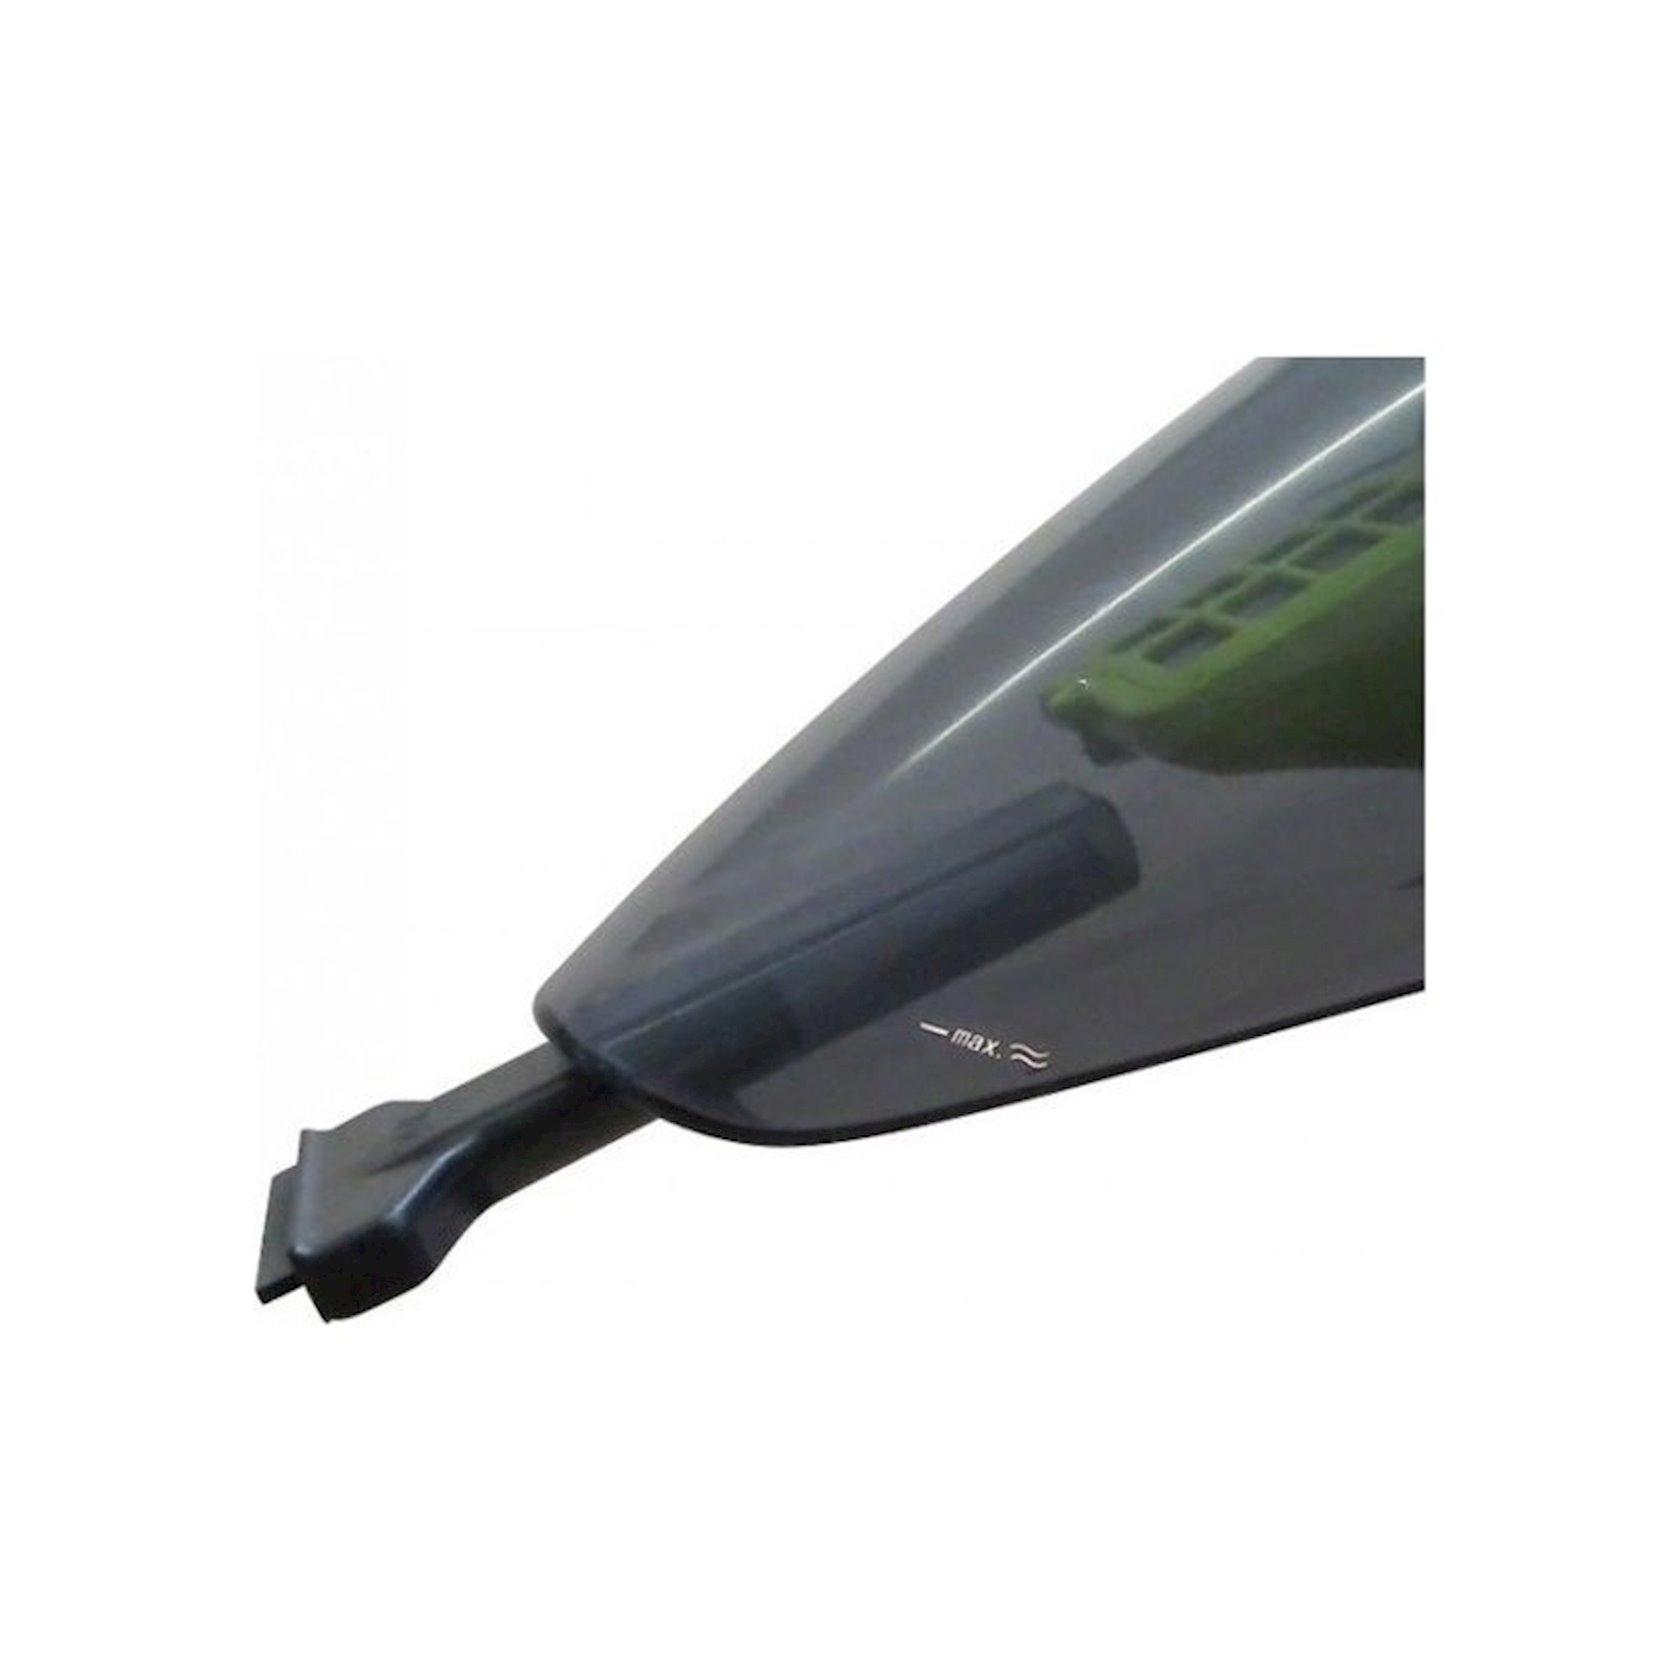 Tozsoran Fakir AS 1037 NT smart Trend Akkussauger anthrazit